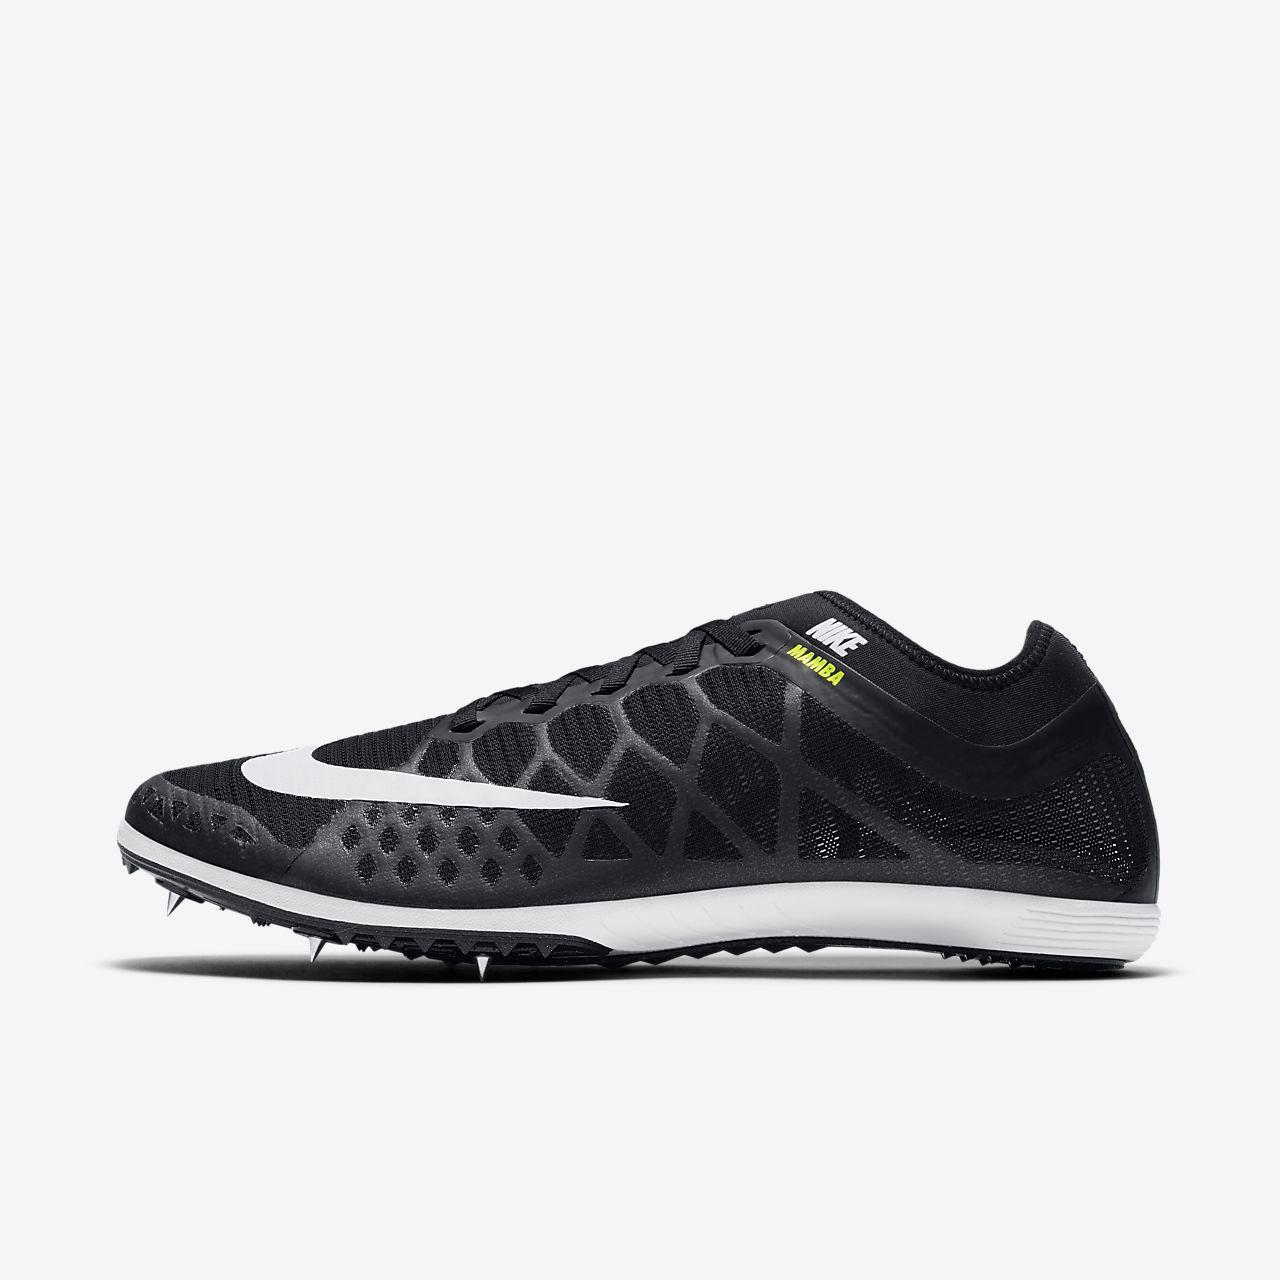 Nike Zoom Mamba 3 - unisex-pigsko til langdistanceløb